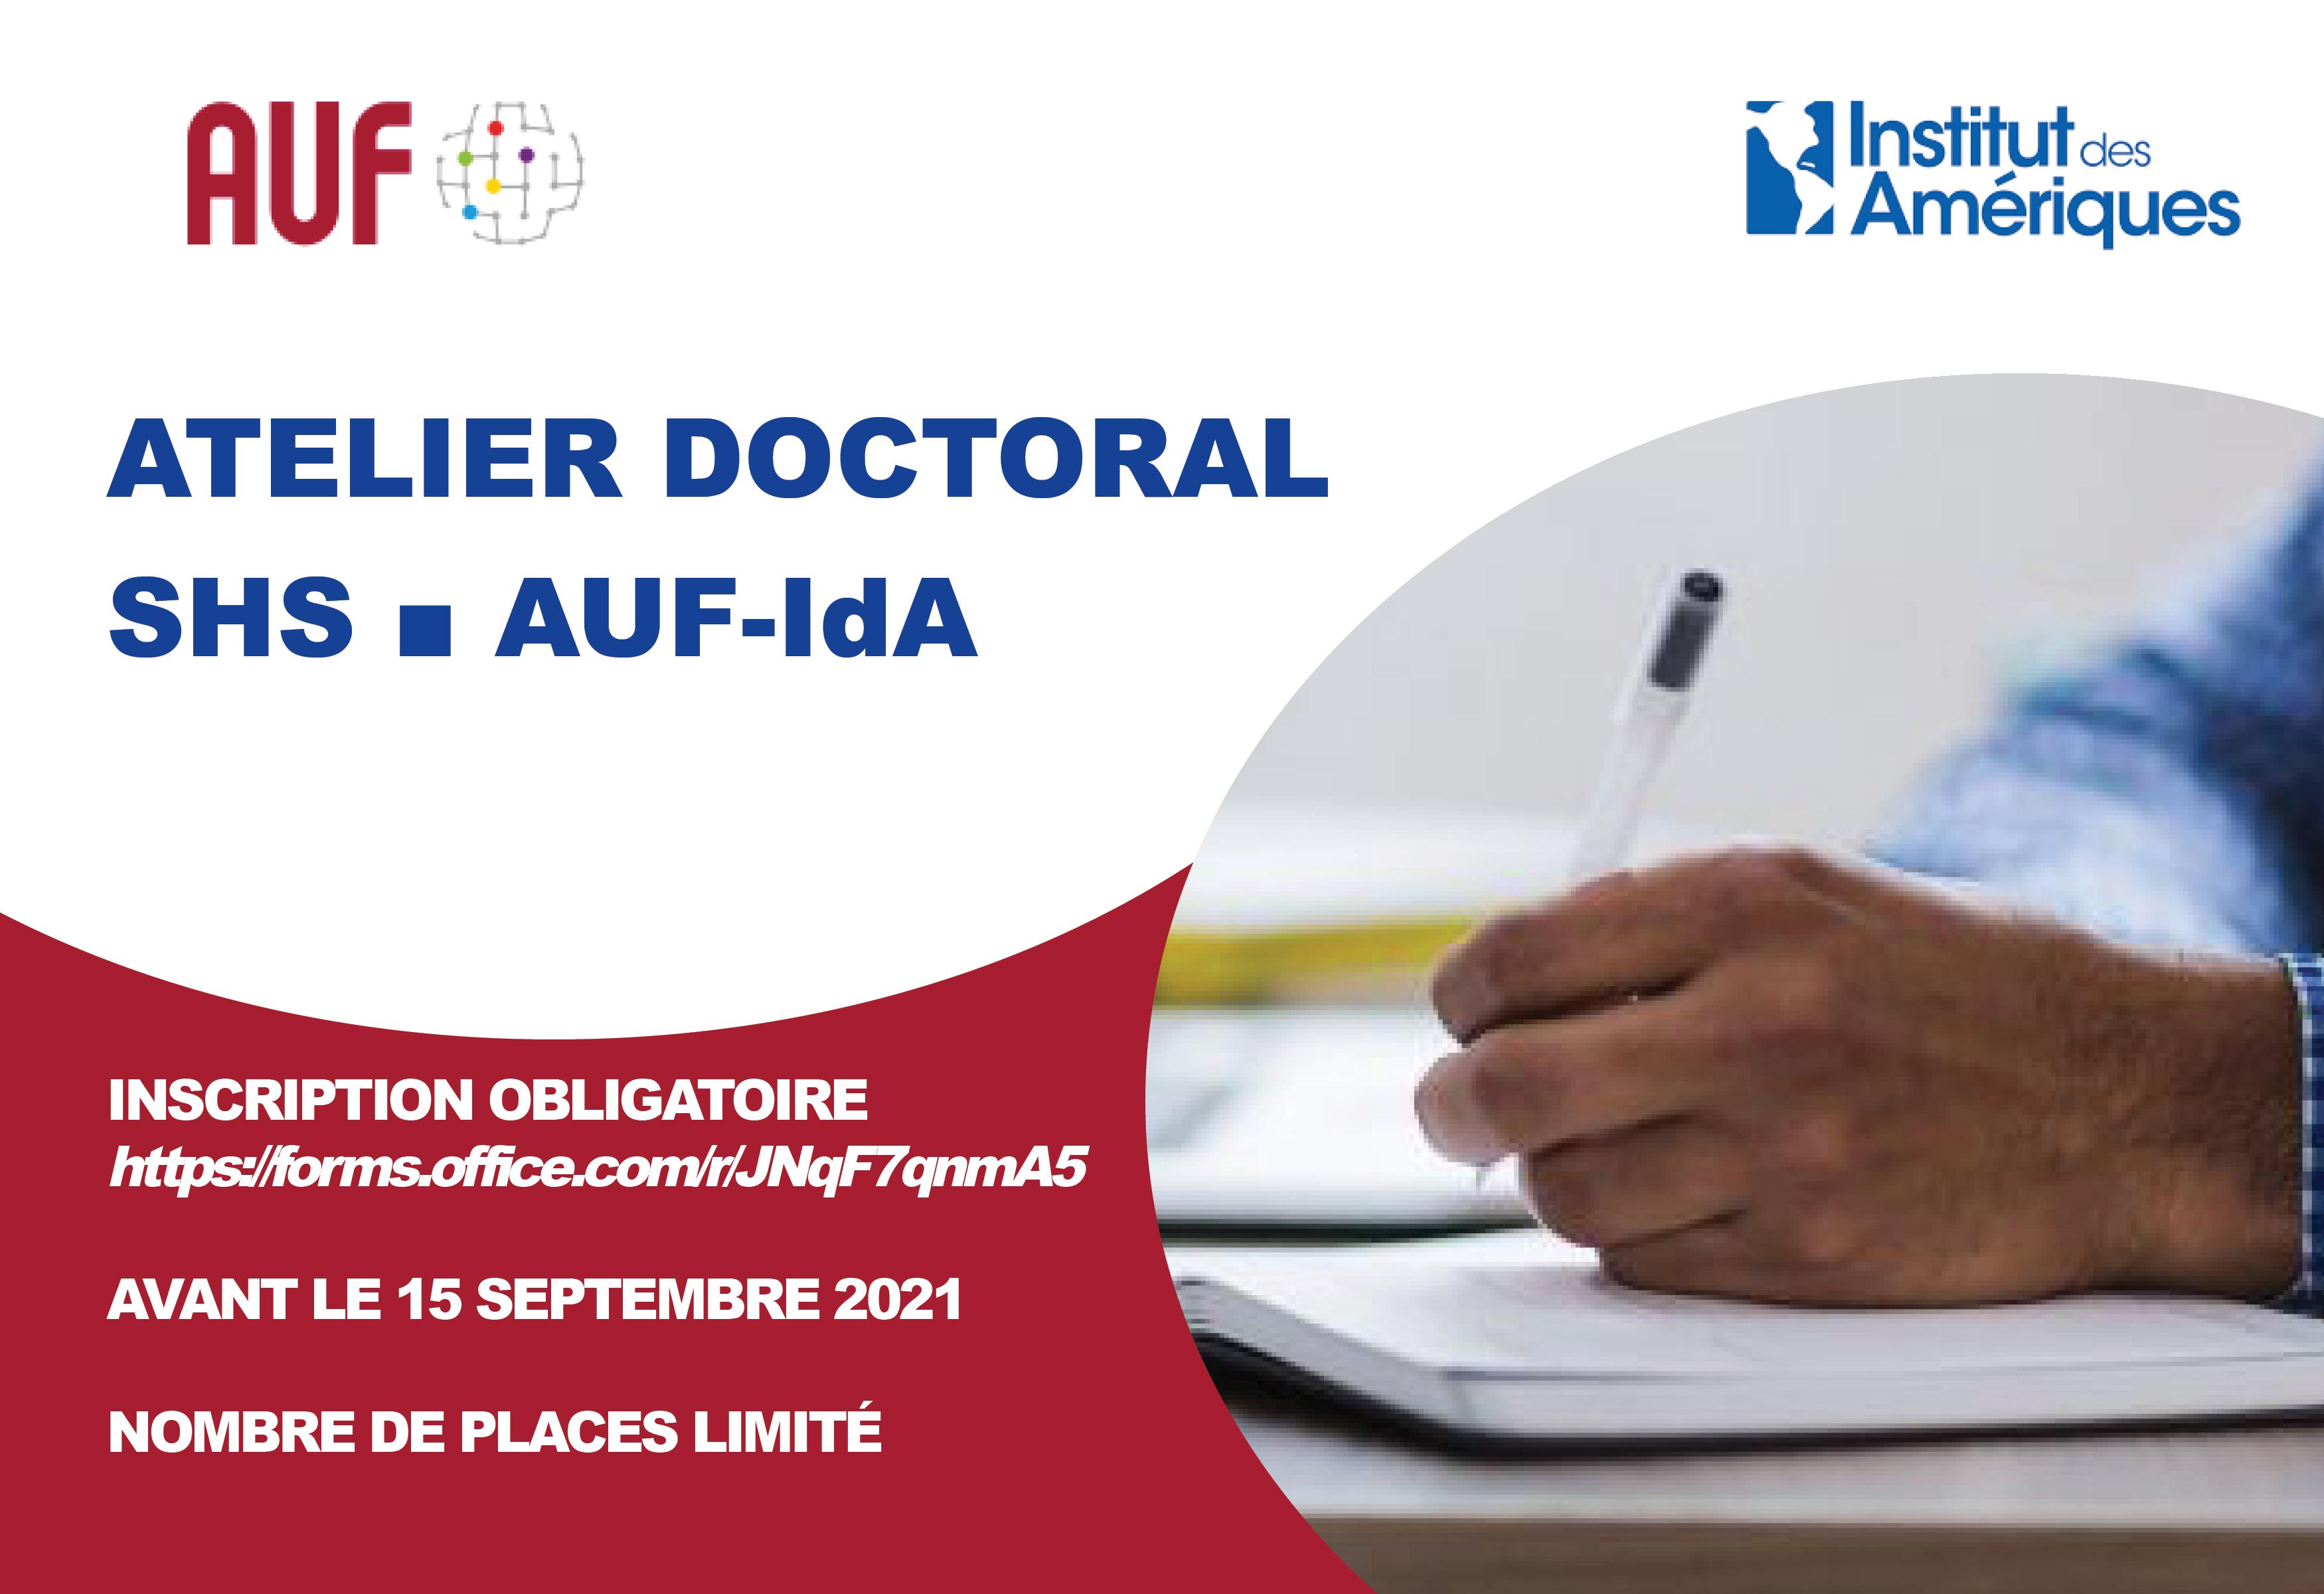 Affiche formulaire atelier doctoral